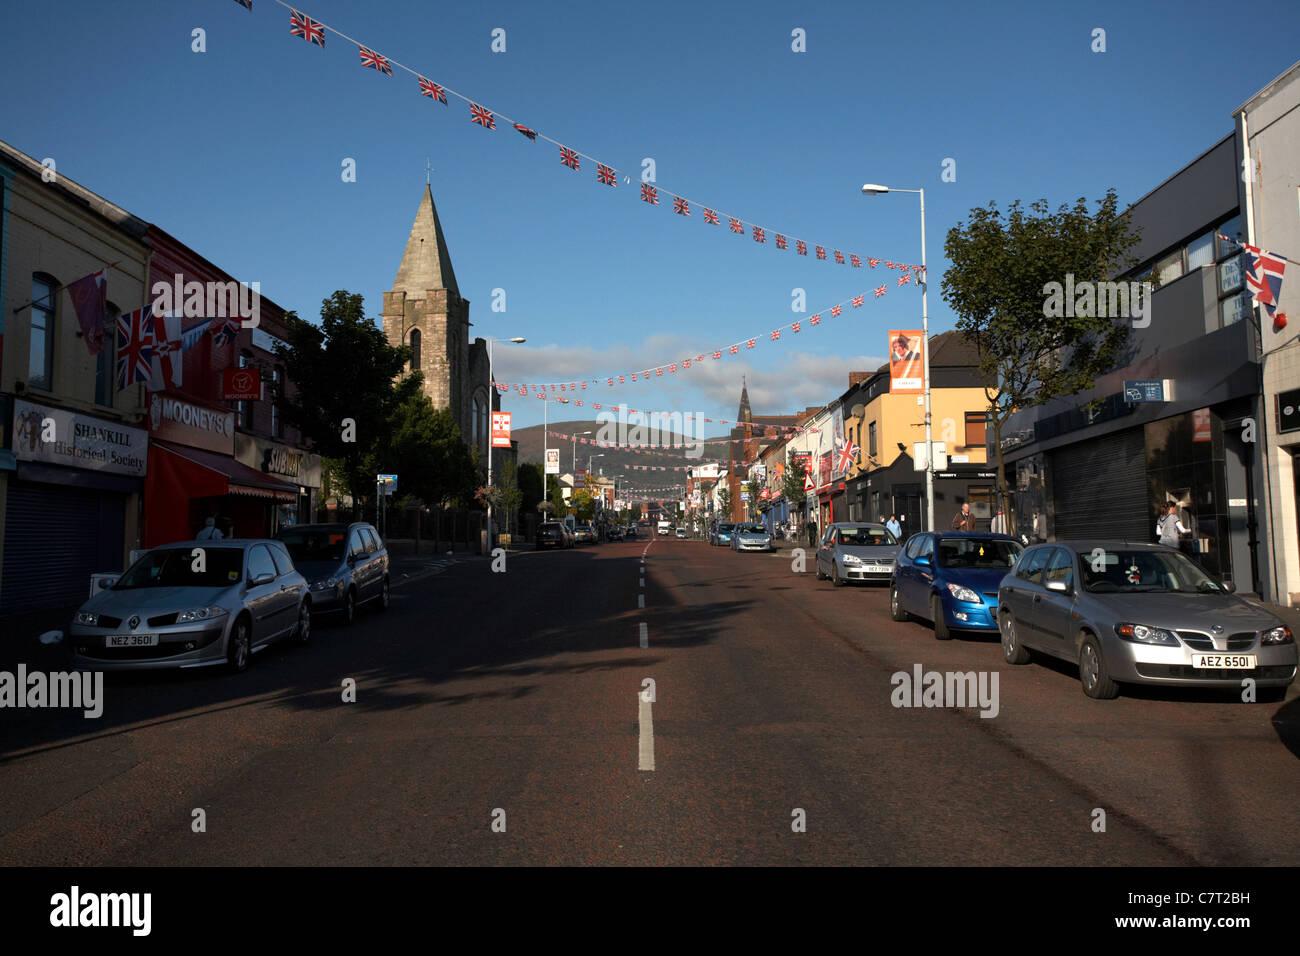 Shankill road, Belfast, Northern Ireland, UK. - Stock Image